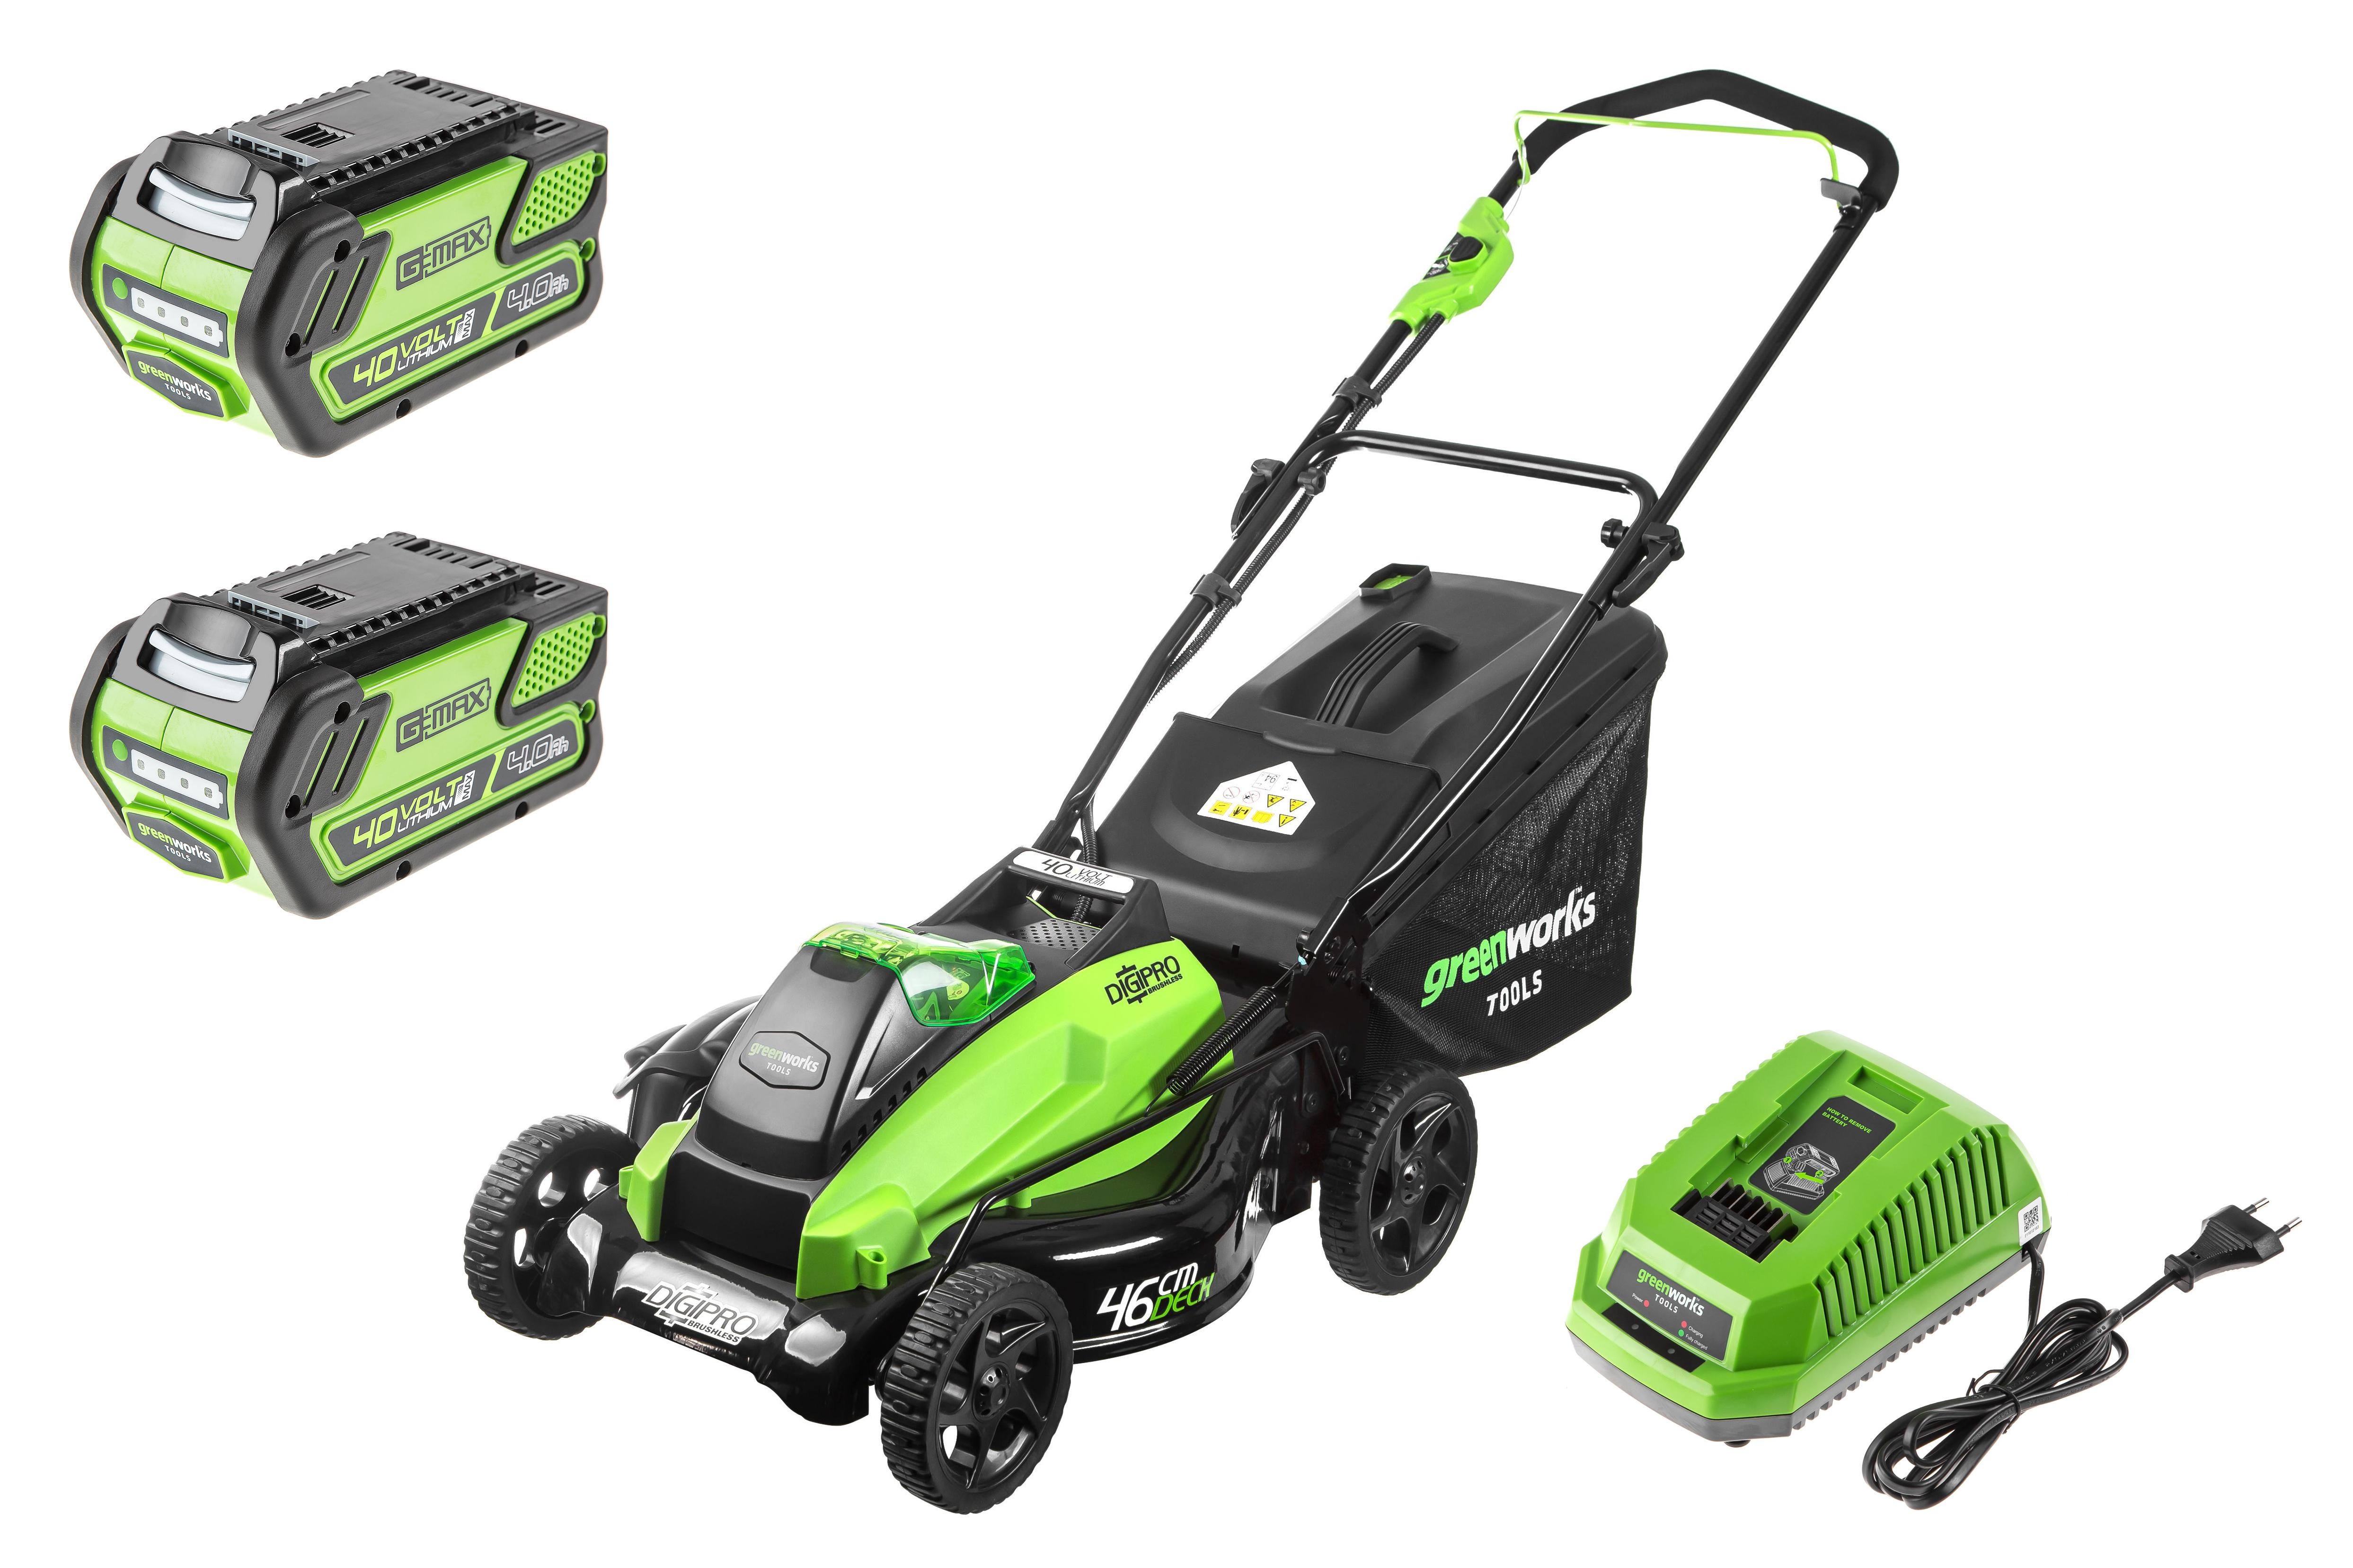 Аккумуляторная газонокосилка Greenworks Gd40lm45 (2500407ub) 1акк 40В 4Ач + ЗУ